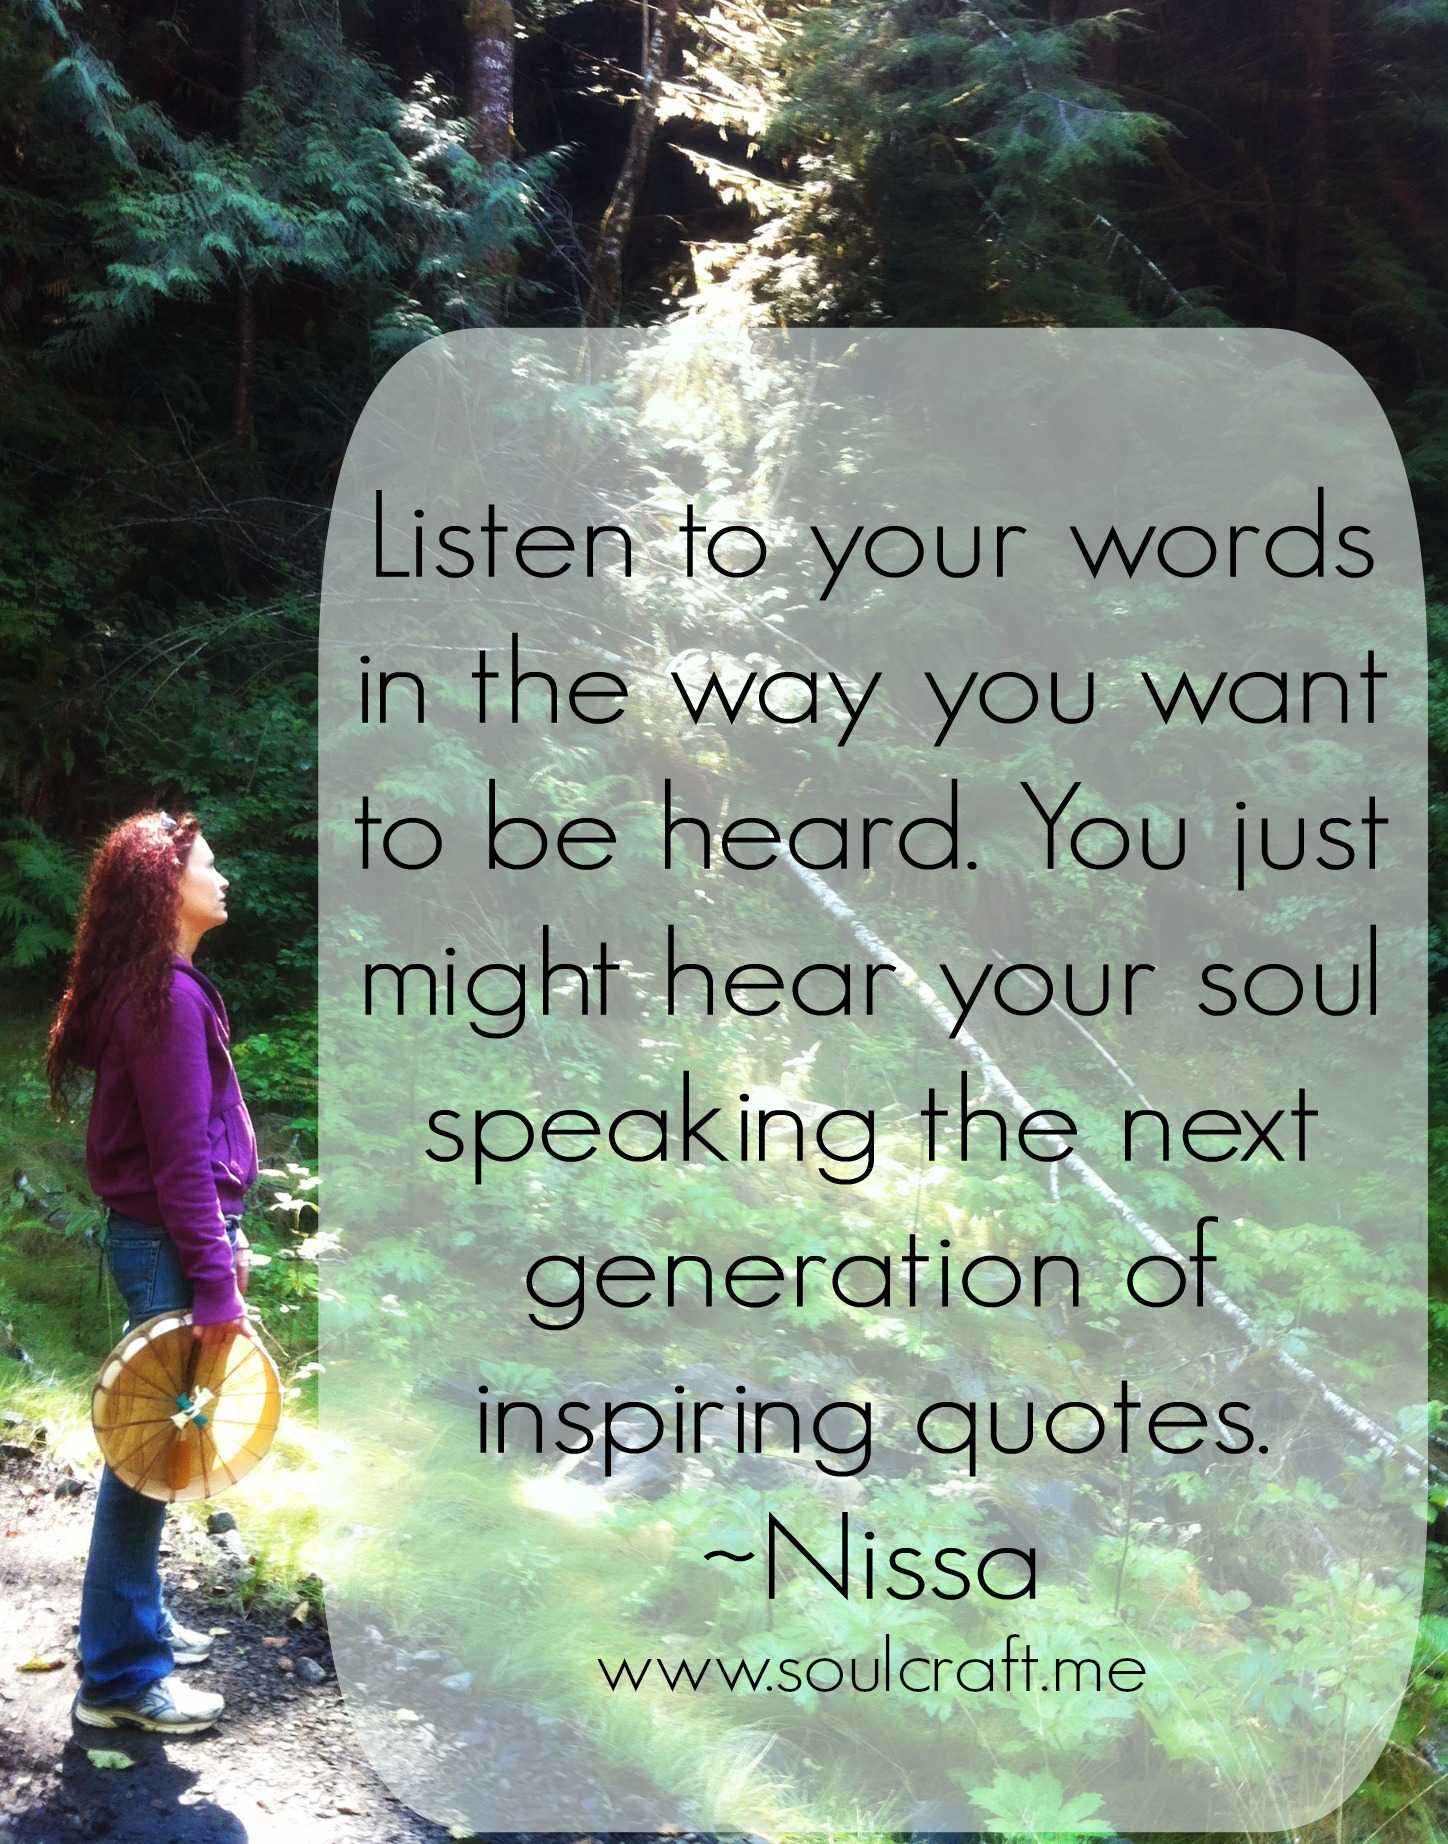 listentoyourwords